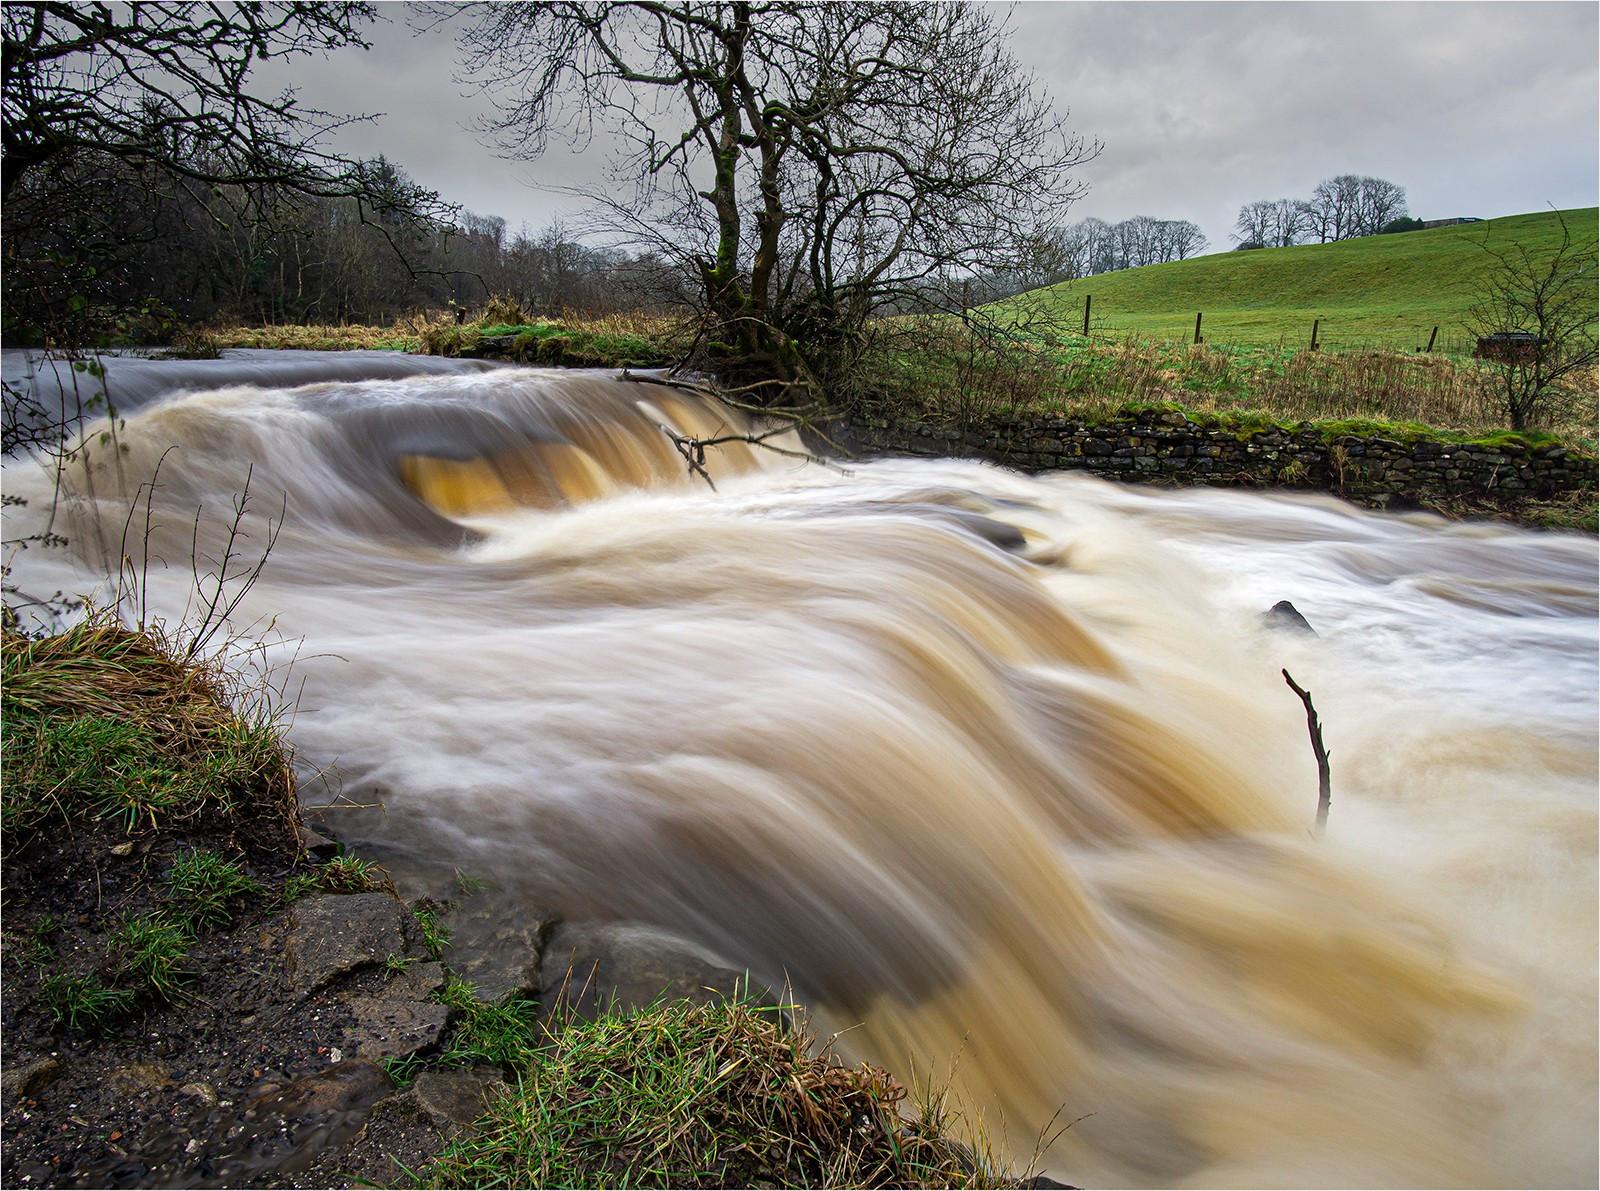 Rageing torrant on colne water. Lancashire